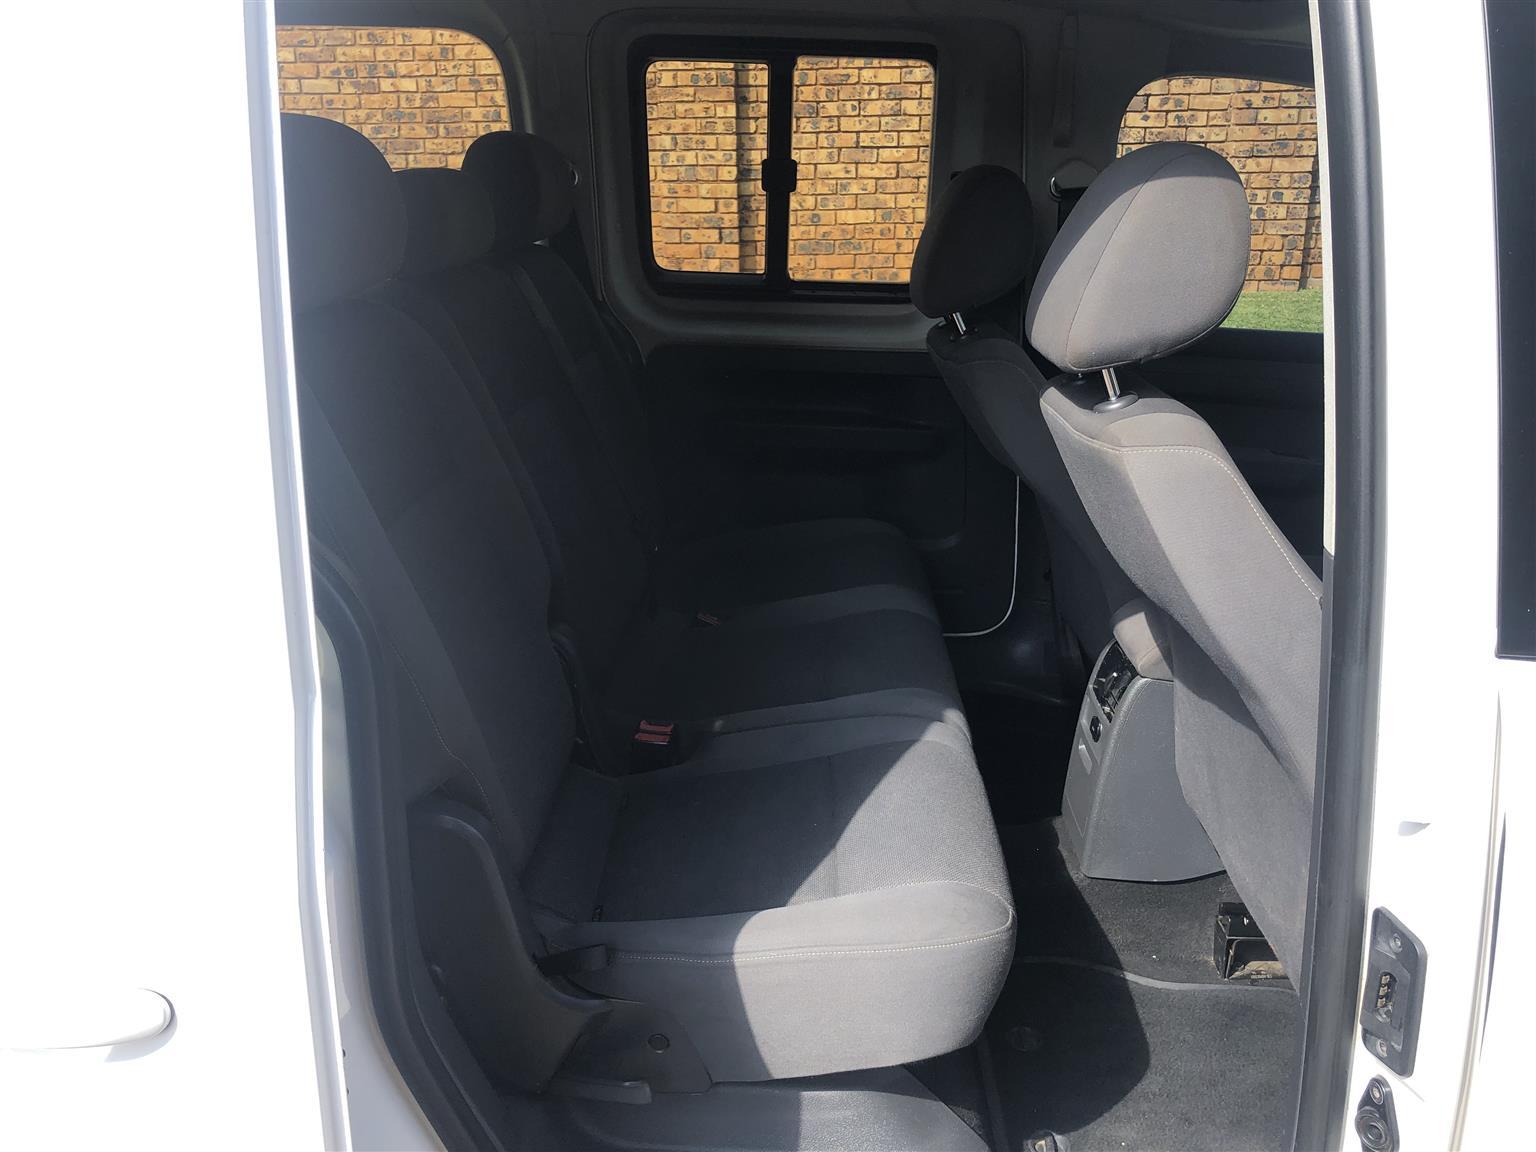 2014 VW Caddy Maxi crew bus CADDY MAXI CREWBUS 2.0 TDi